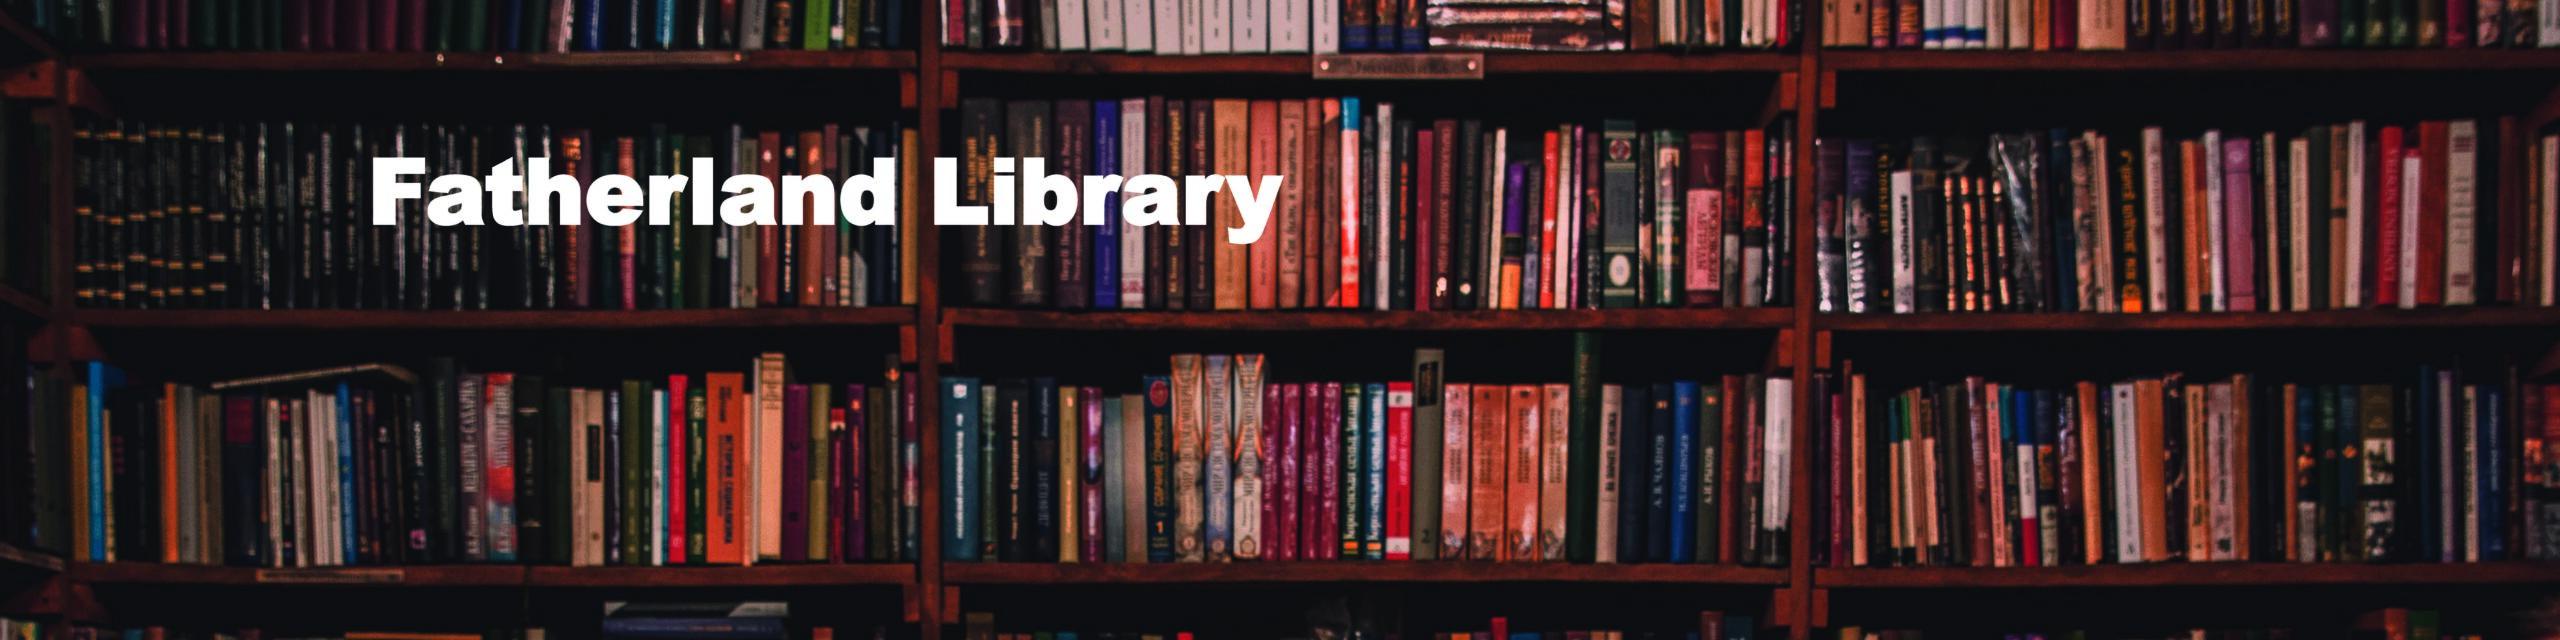 Fatherland Library-books02